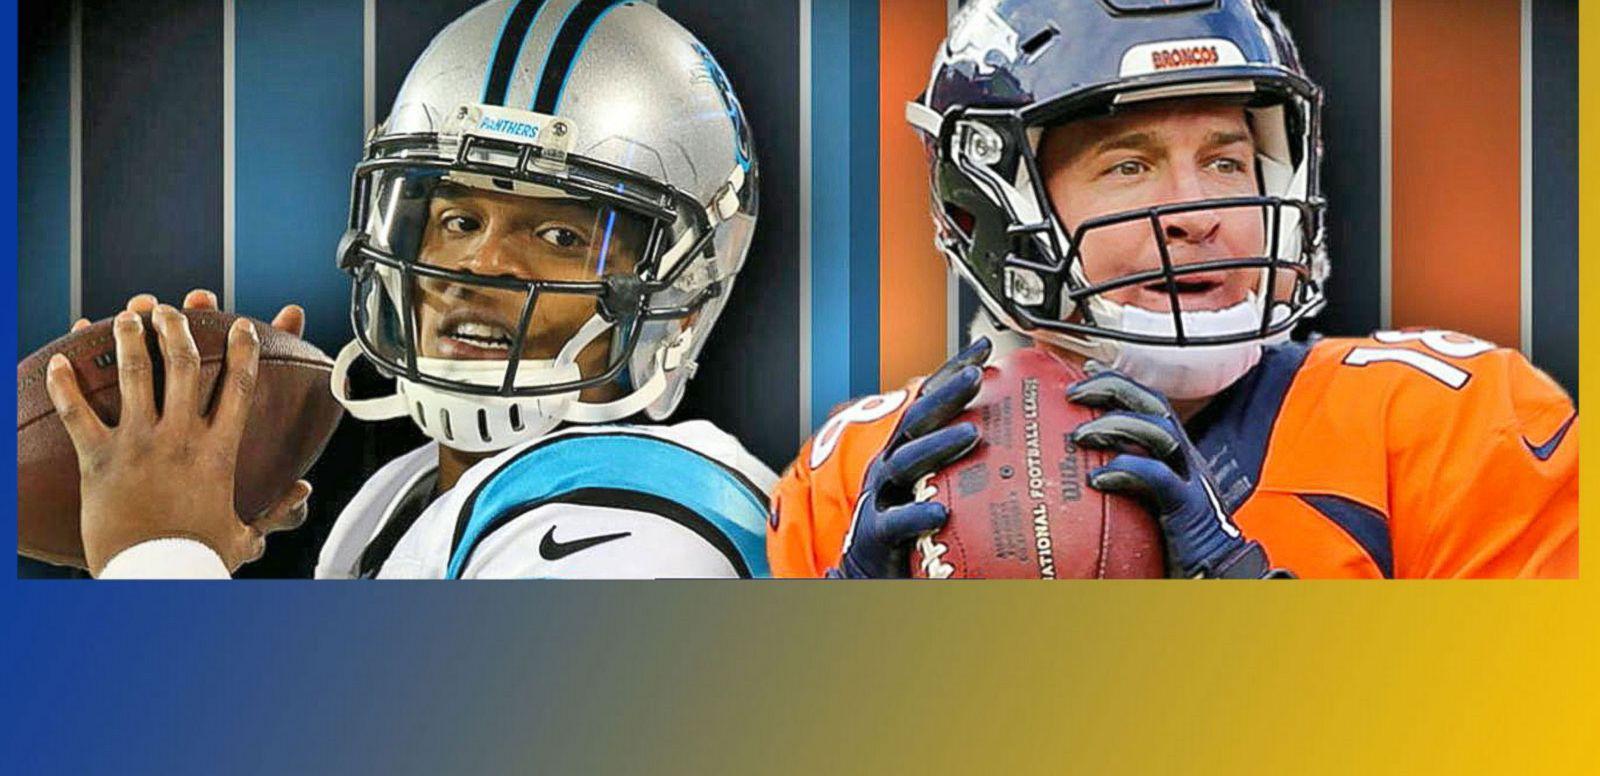 VIDEO: Super Bowl 50 Quarterback Comparisons